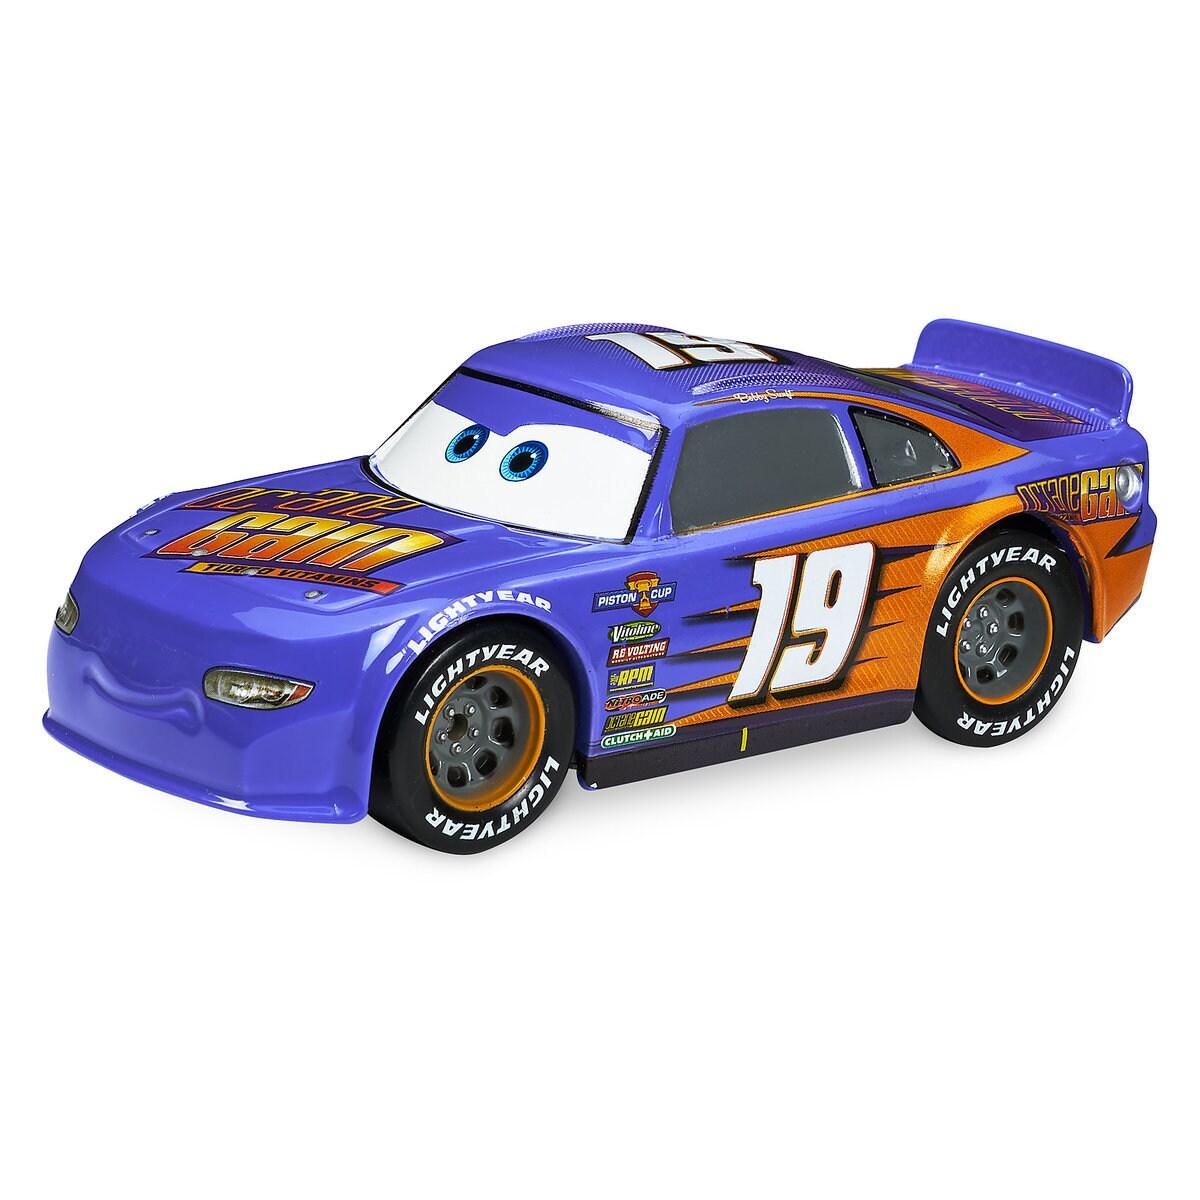 Bobby Swift Pull 'N' Race Die Cast Car - Cars